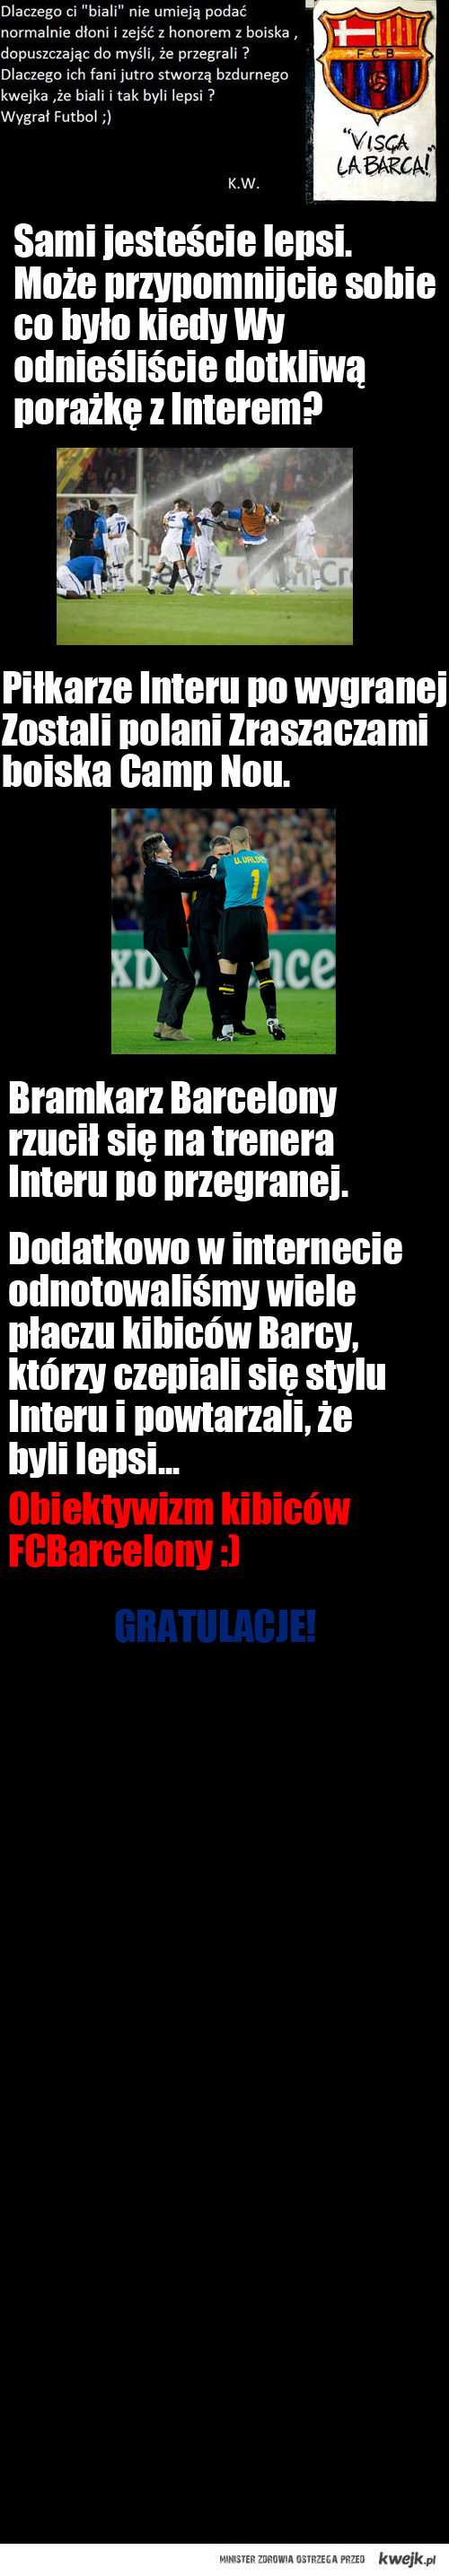 FCB - IFC